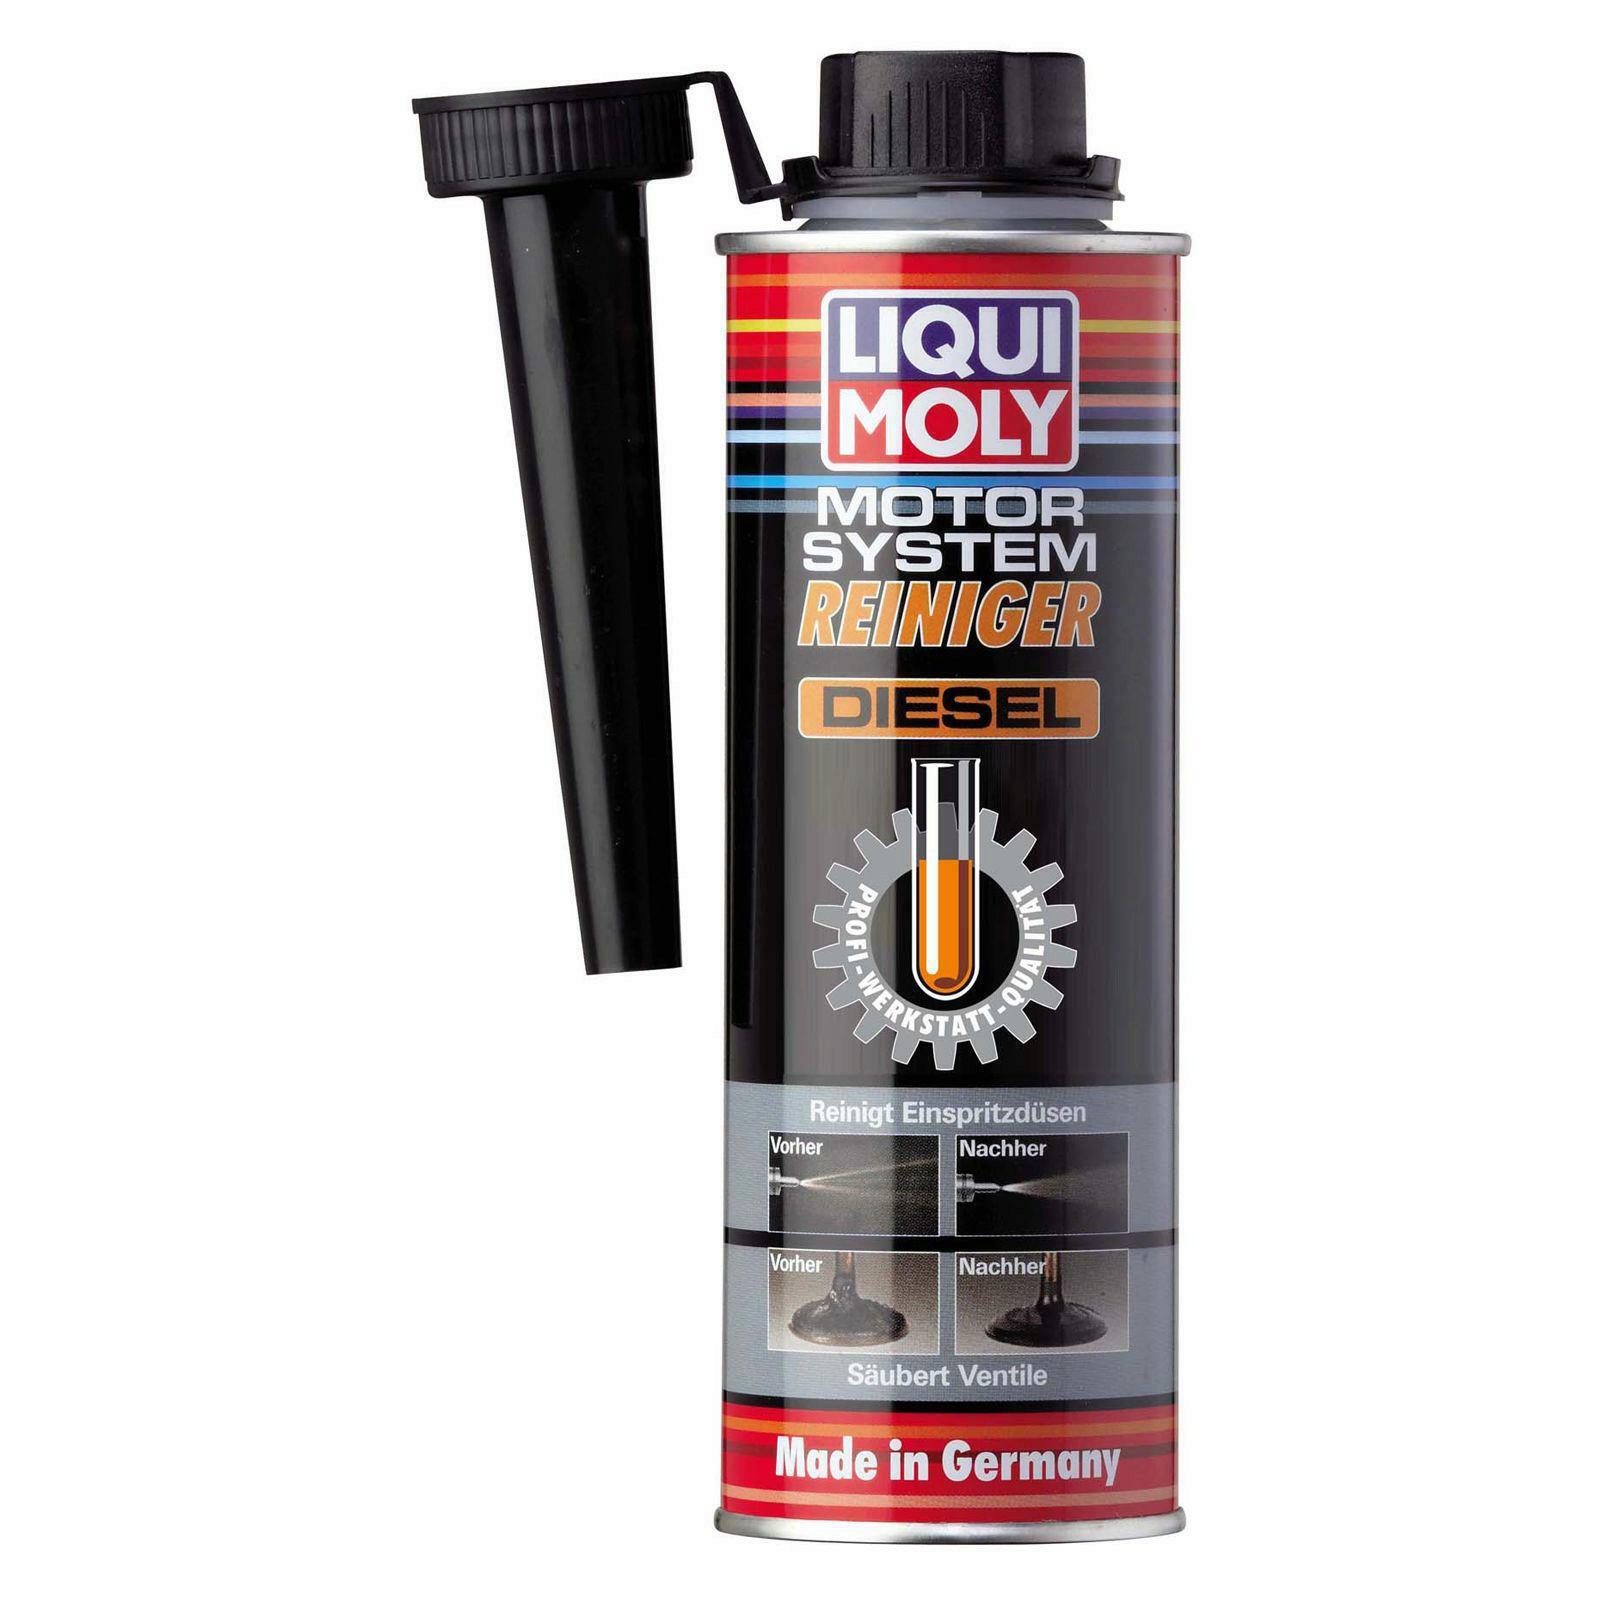 Liqui Moly Motor-System-Reiniger Diesel 300ml